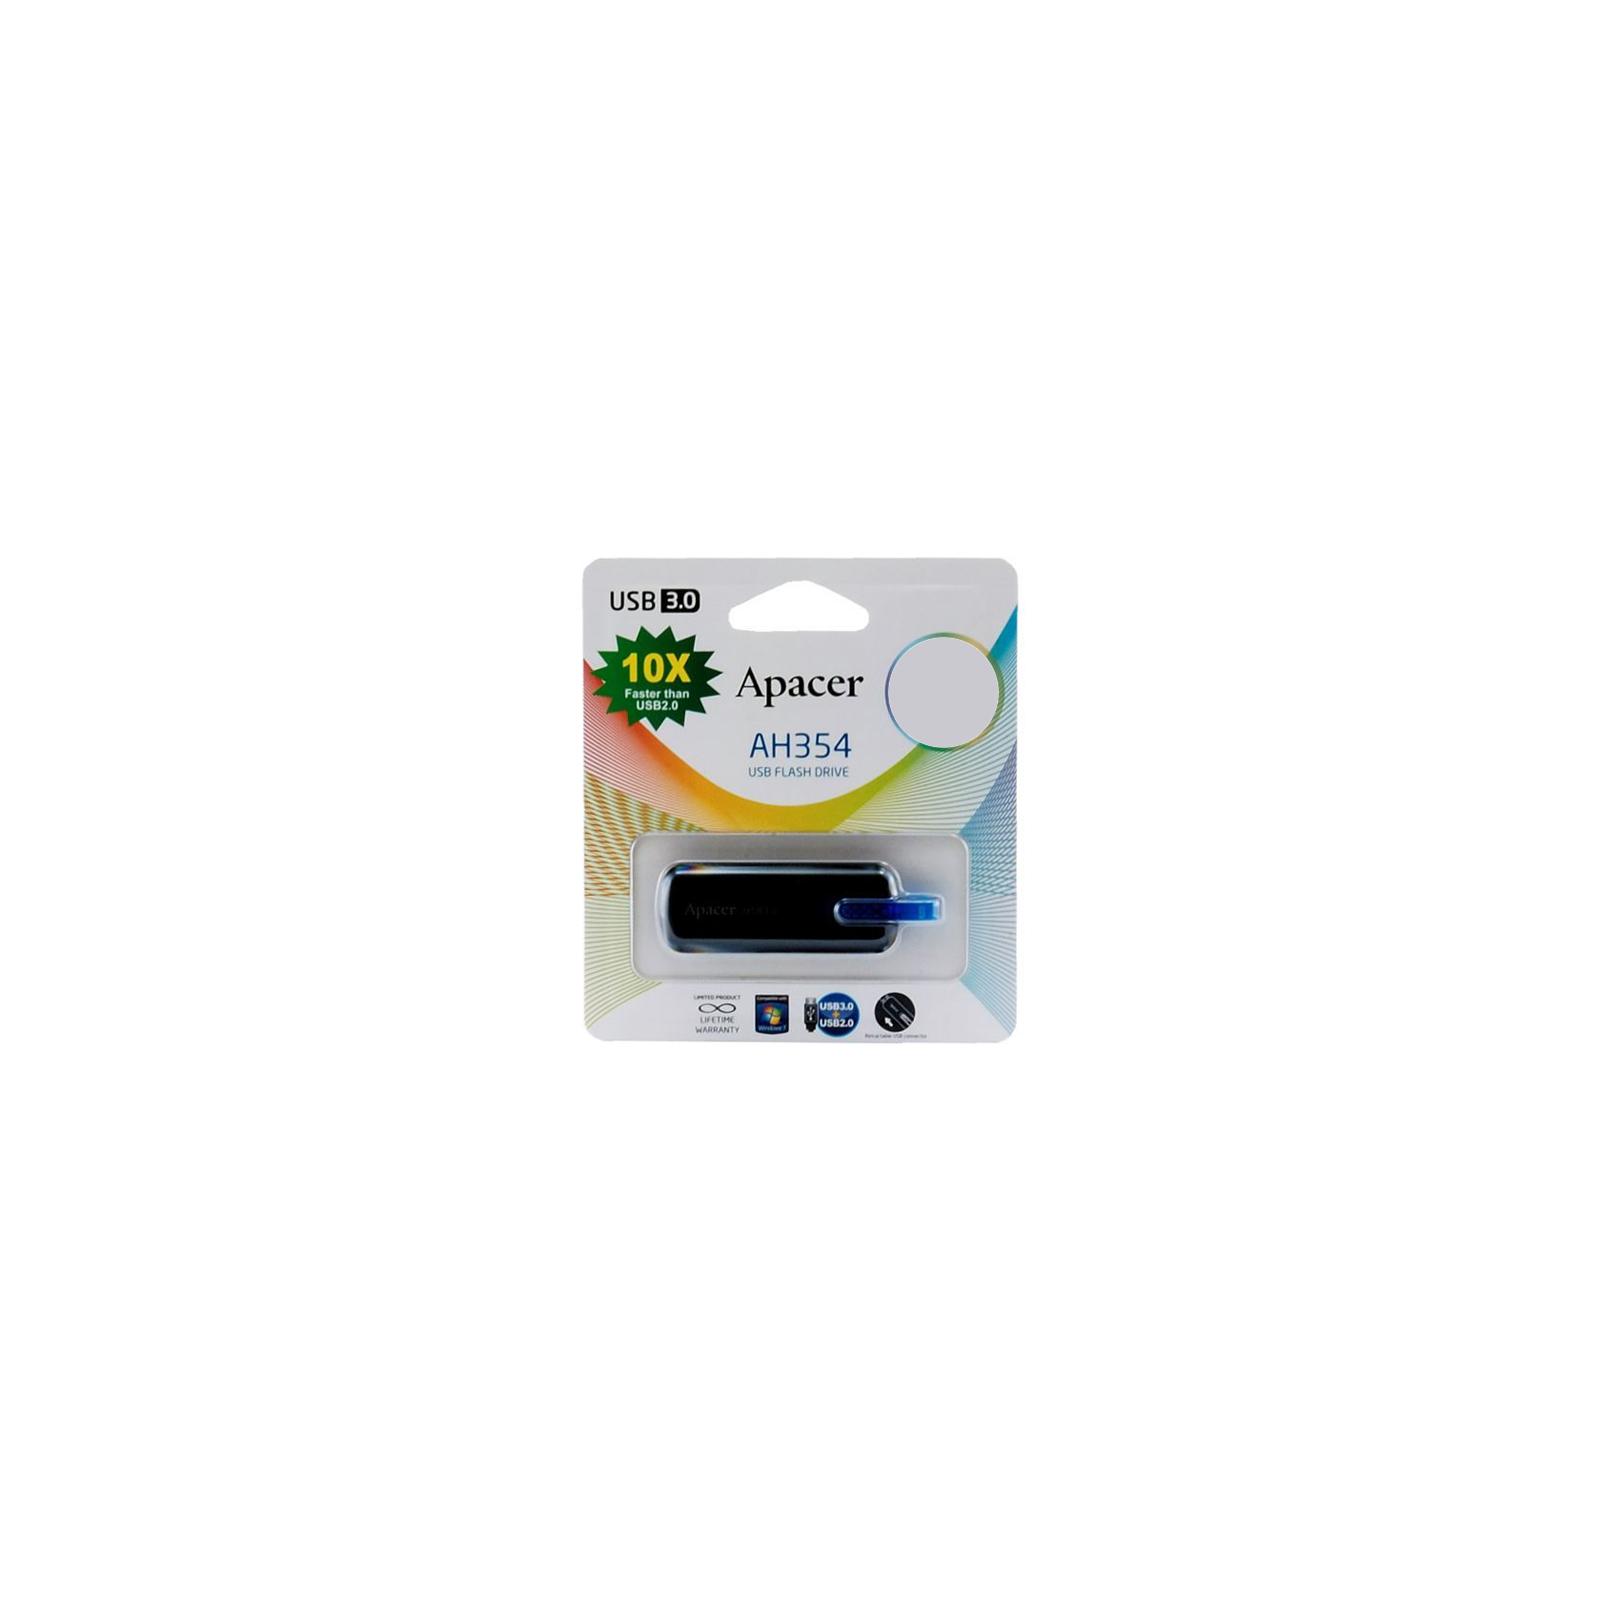 USB флеш накопитель 16GB AH354 Black RP USB3.0 Apacer (AP16GAH354B-1) изображение 9